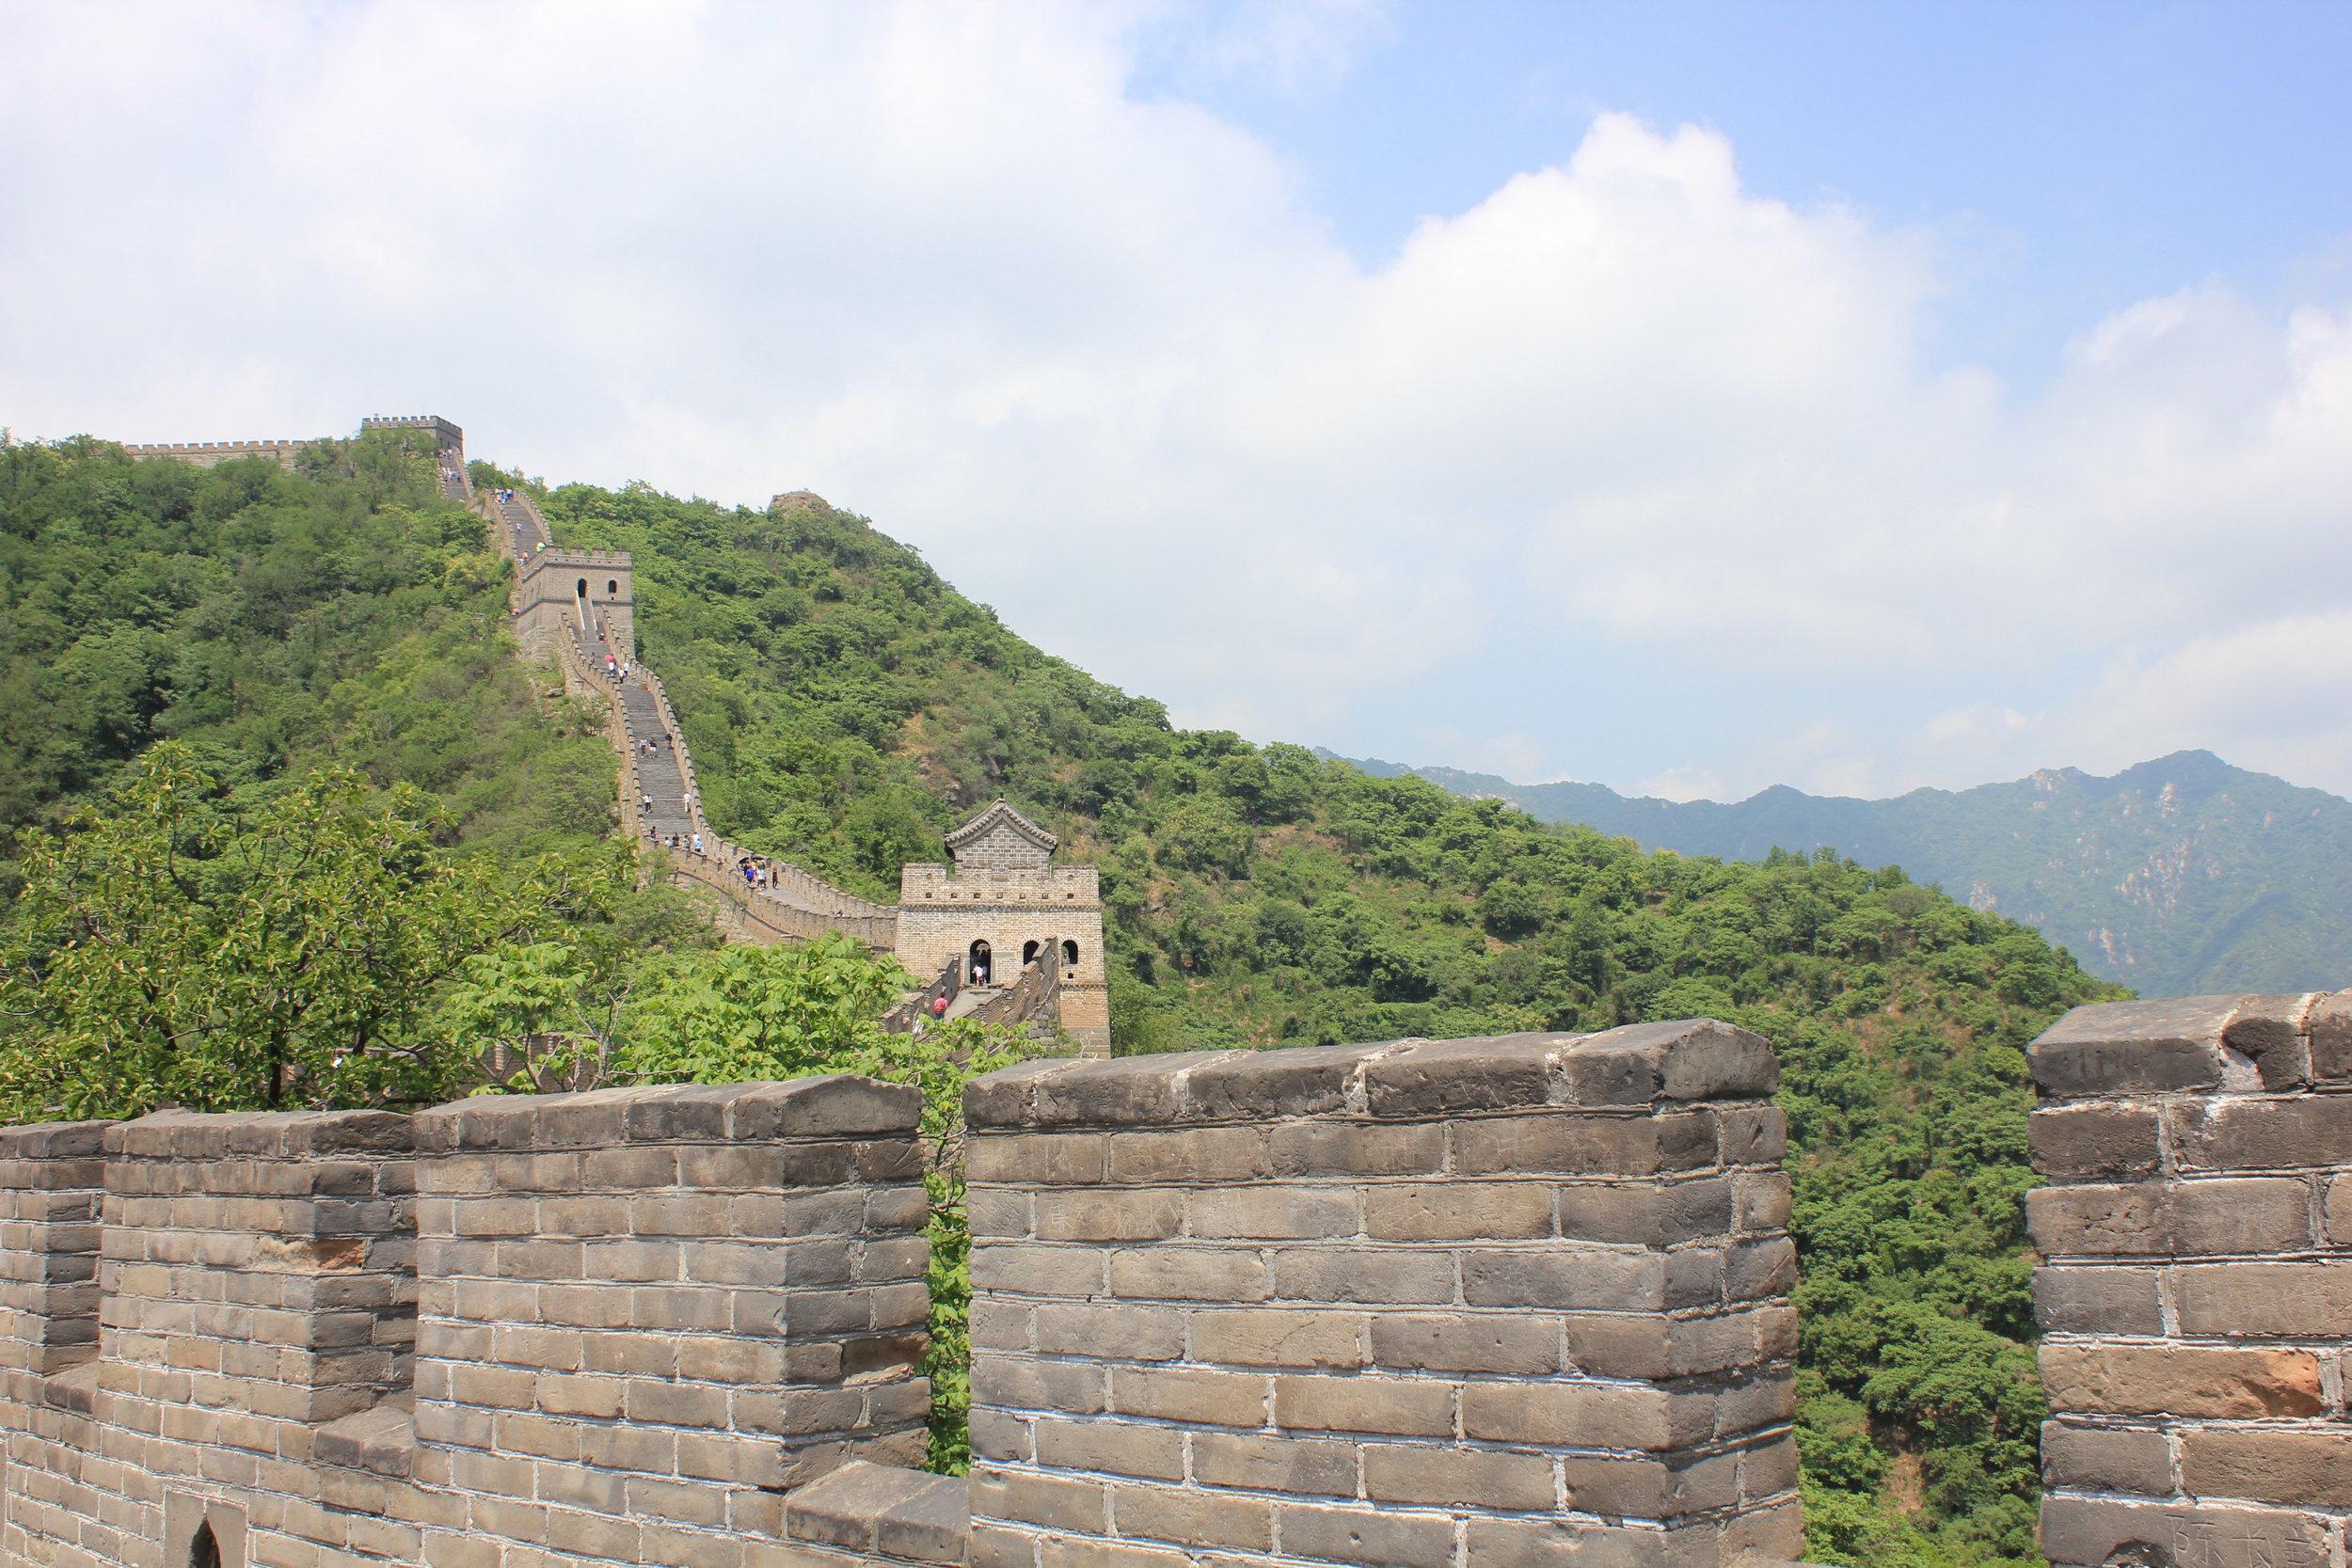 Mutianyu Great Wall – Watchtowers